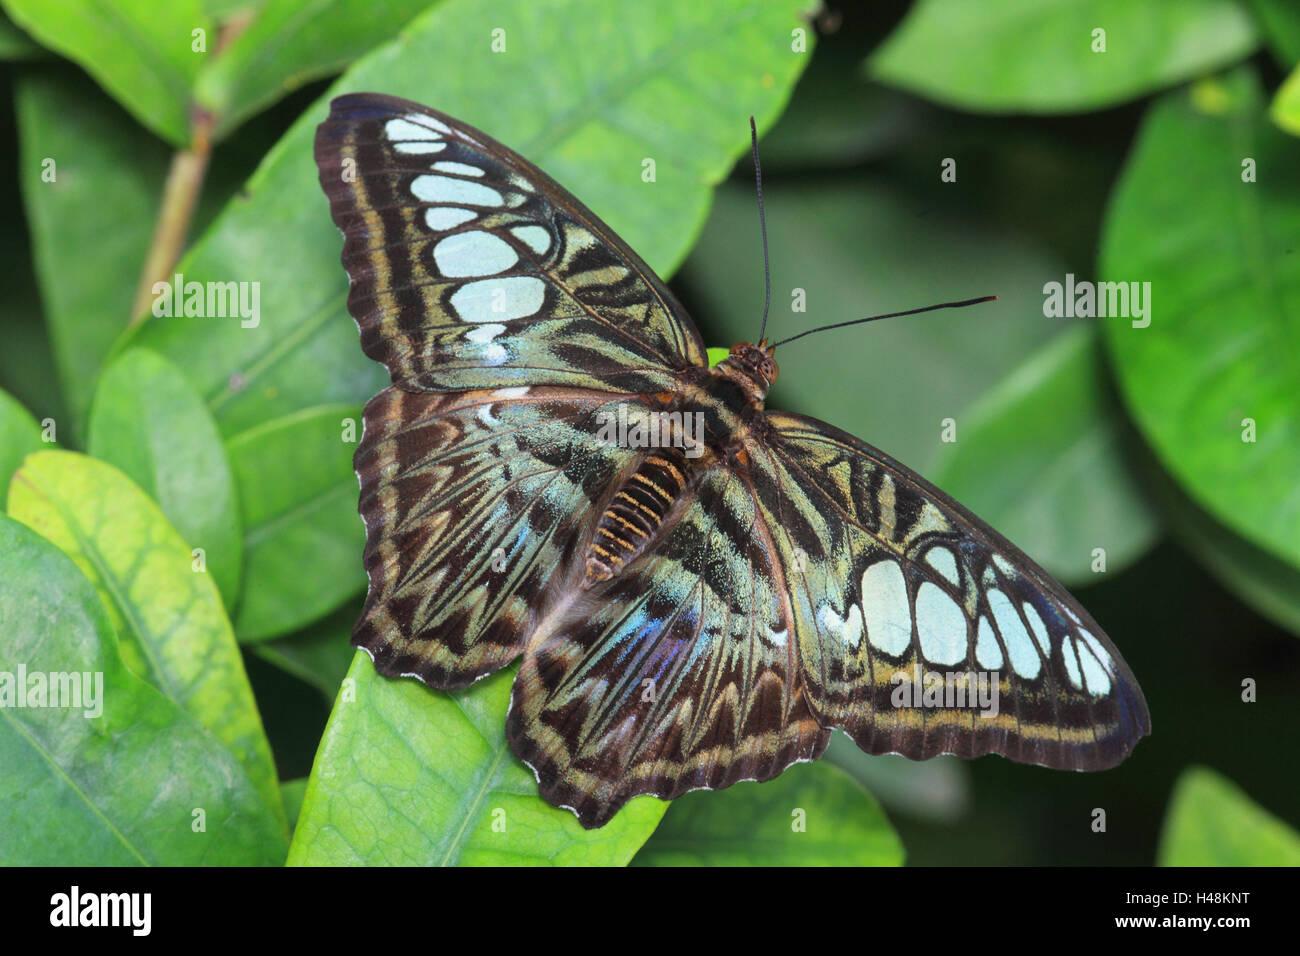 Tiger's Butterflies, medium close-up, formato orizzontale, in Asia, di insetto, animale selvatico, butterfly, Immagini Stock